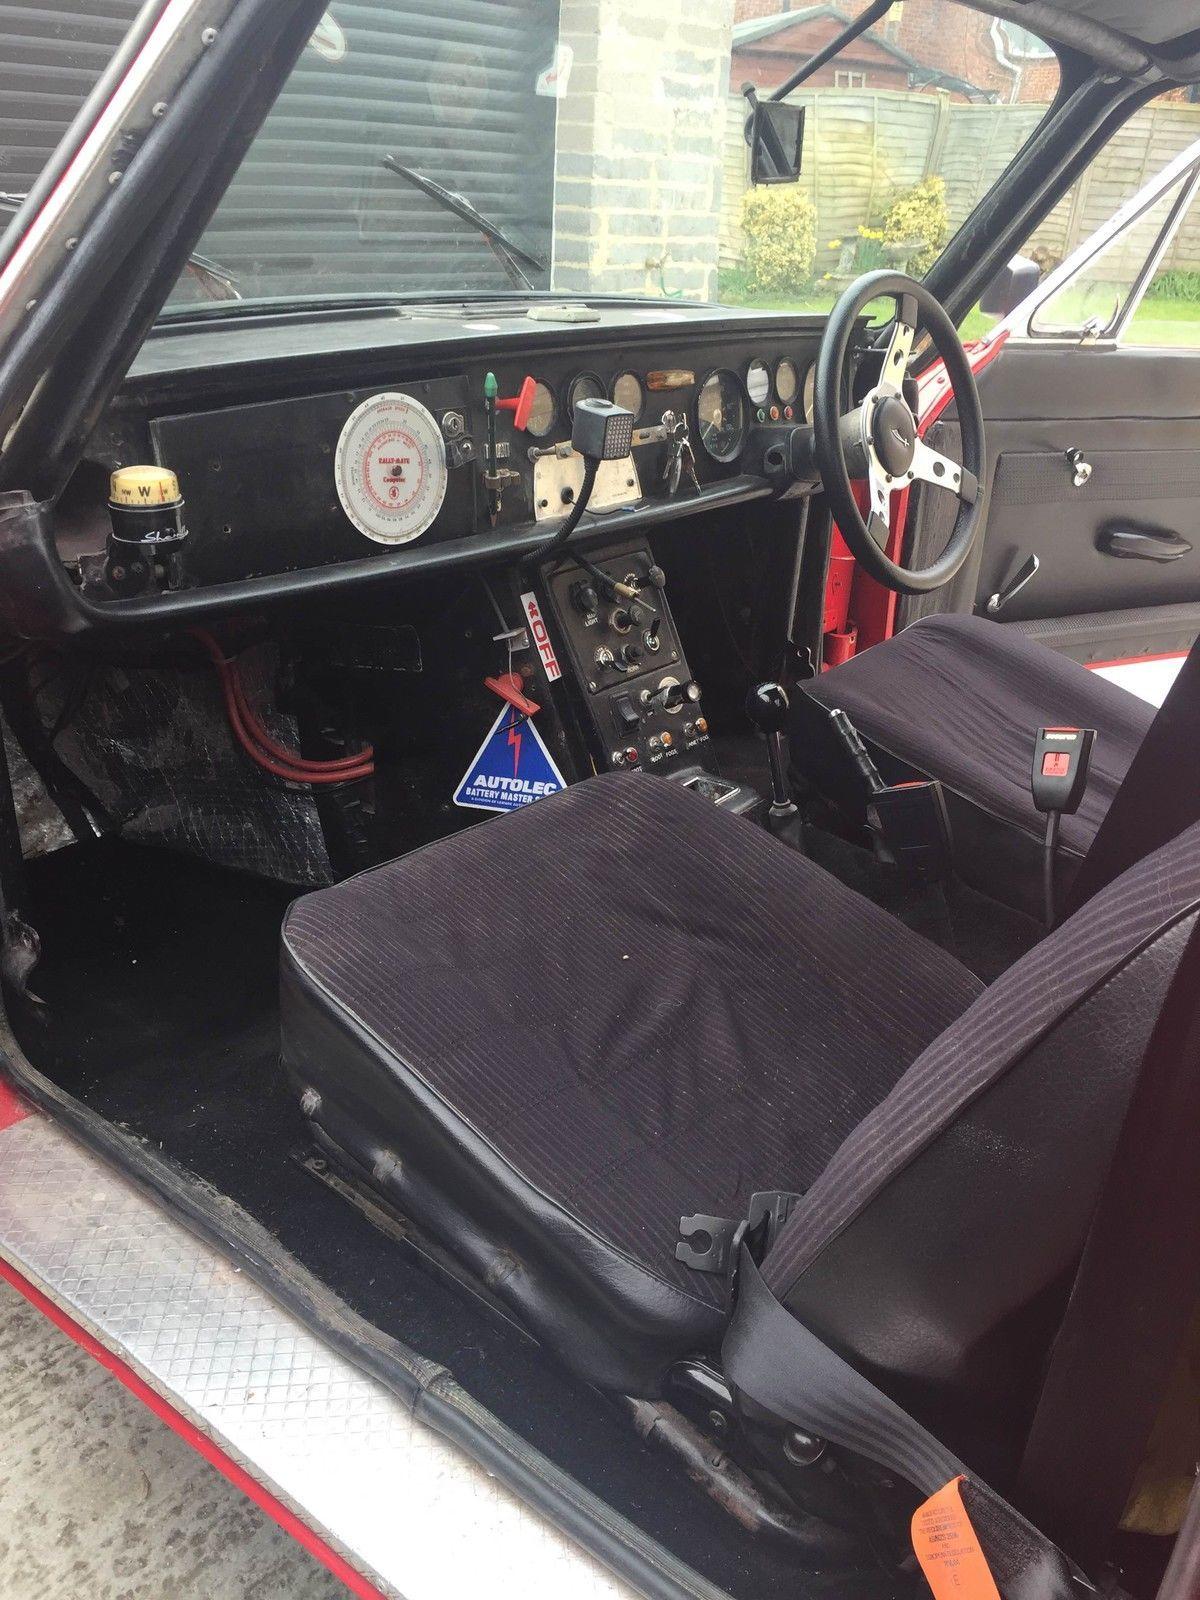 RELIANT SCIMITAR GT 1967 HISTORIC FIA RALLY CAR in Cars, Motorcycles ...